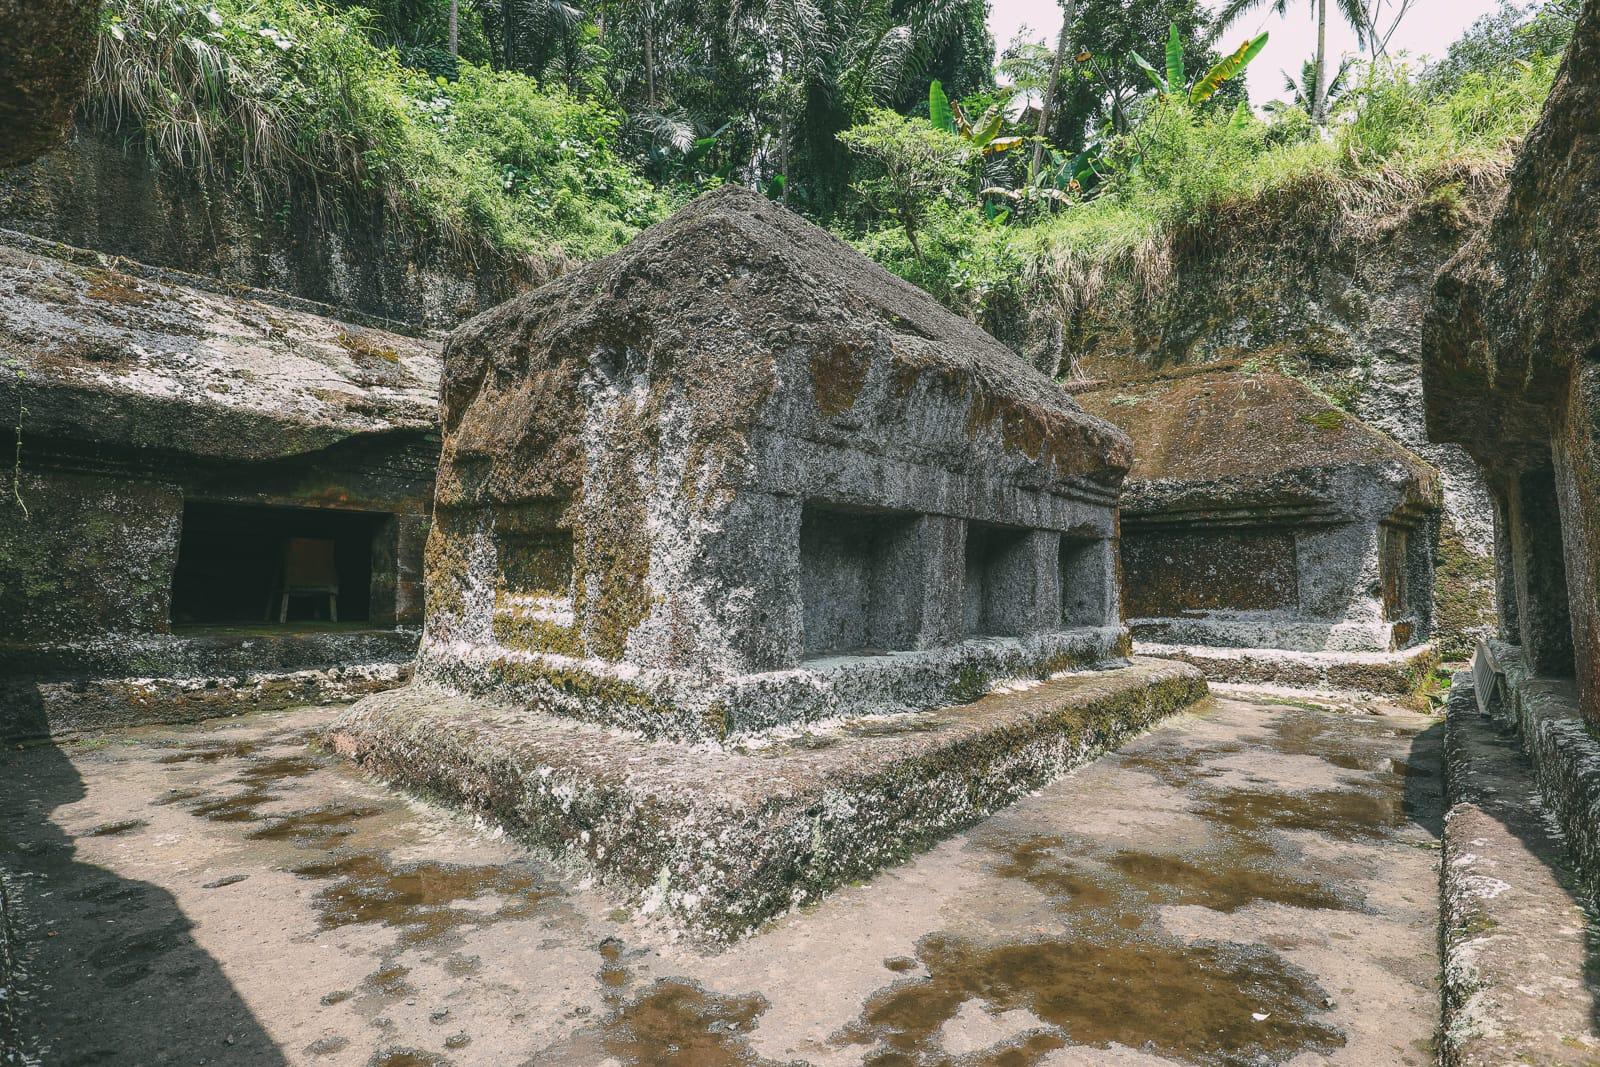 Bali Travel - Tegalalang Rice Terrace In Ubud And Gunung Kawi Temple (34)